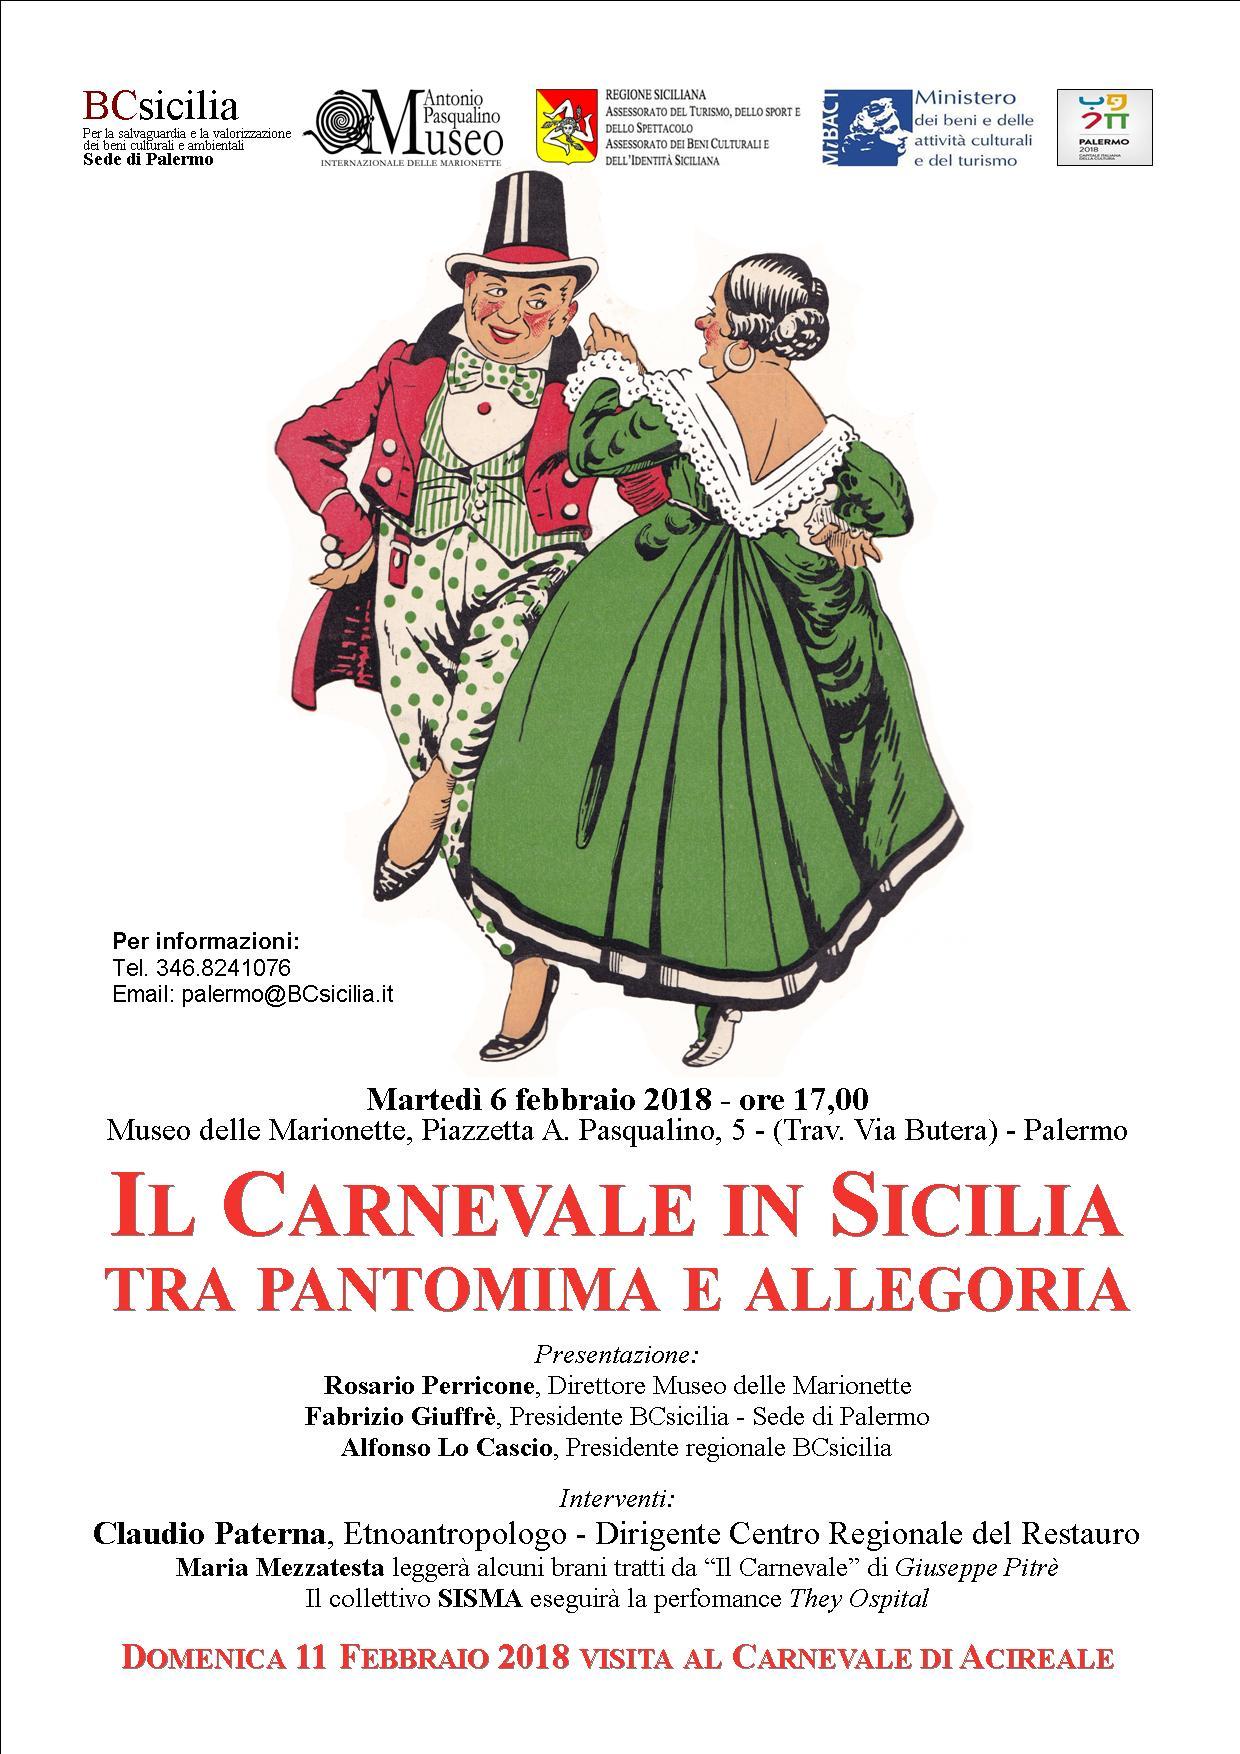 BCsicilia_Conferenza_Carnevale.jpg - 282.81 kB